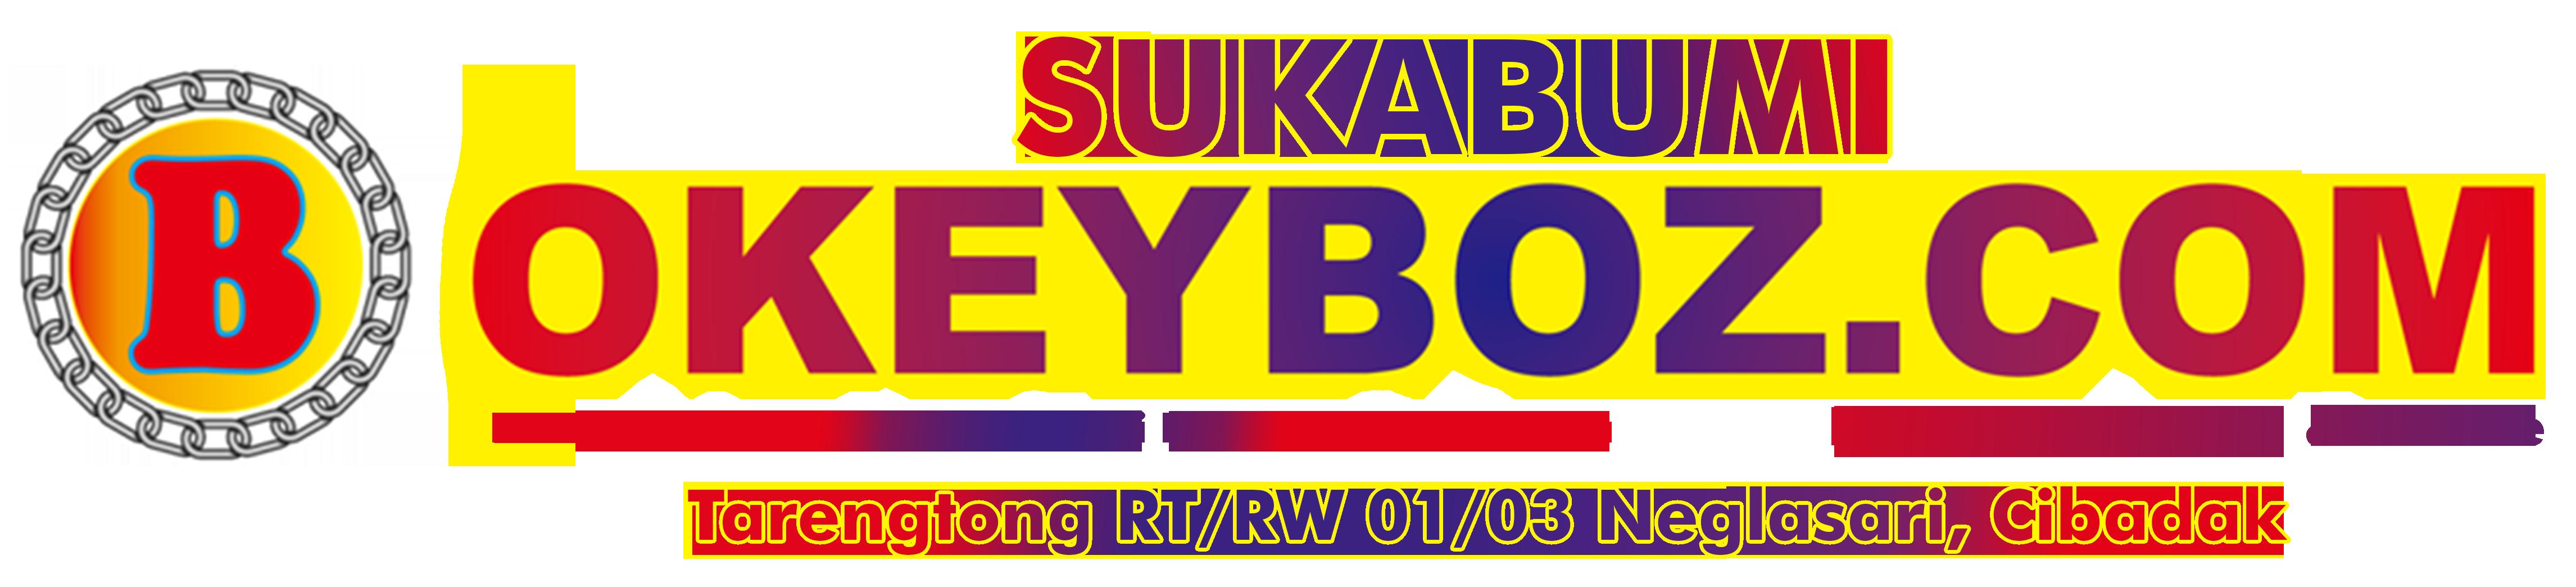 Sukabumi Okeyboz